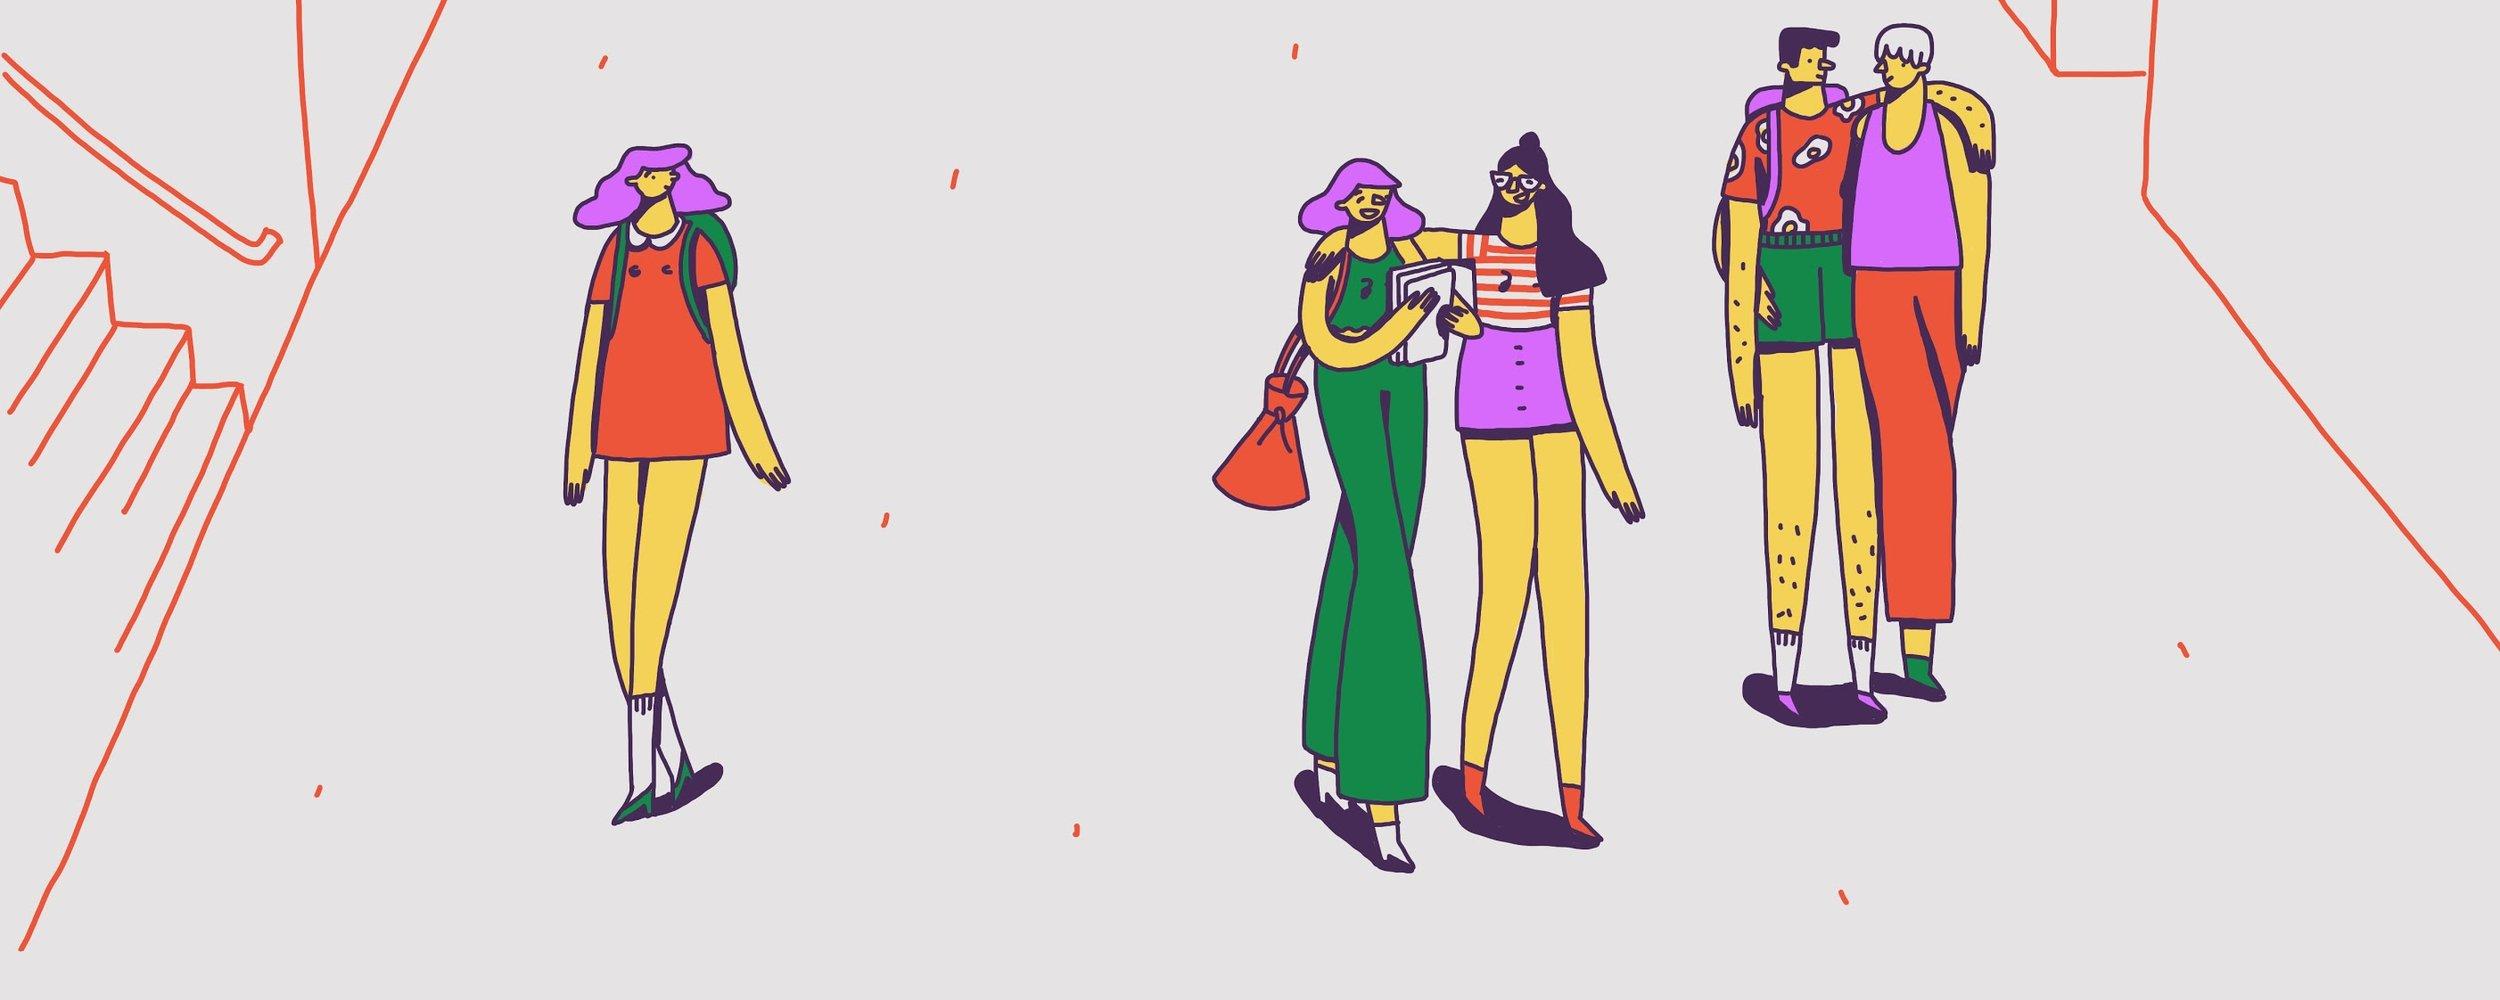 Teen Vogue Ask A Sex Educator Illustrations